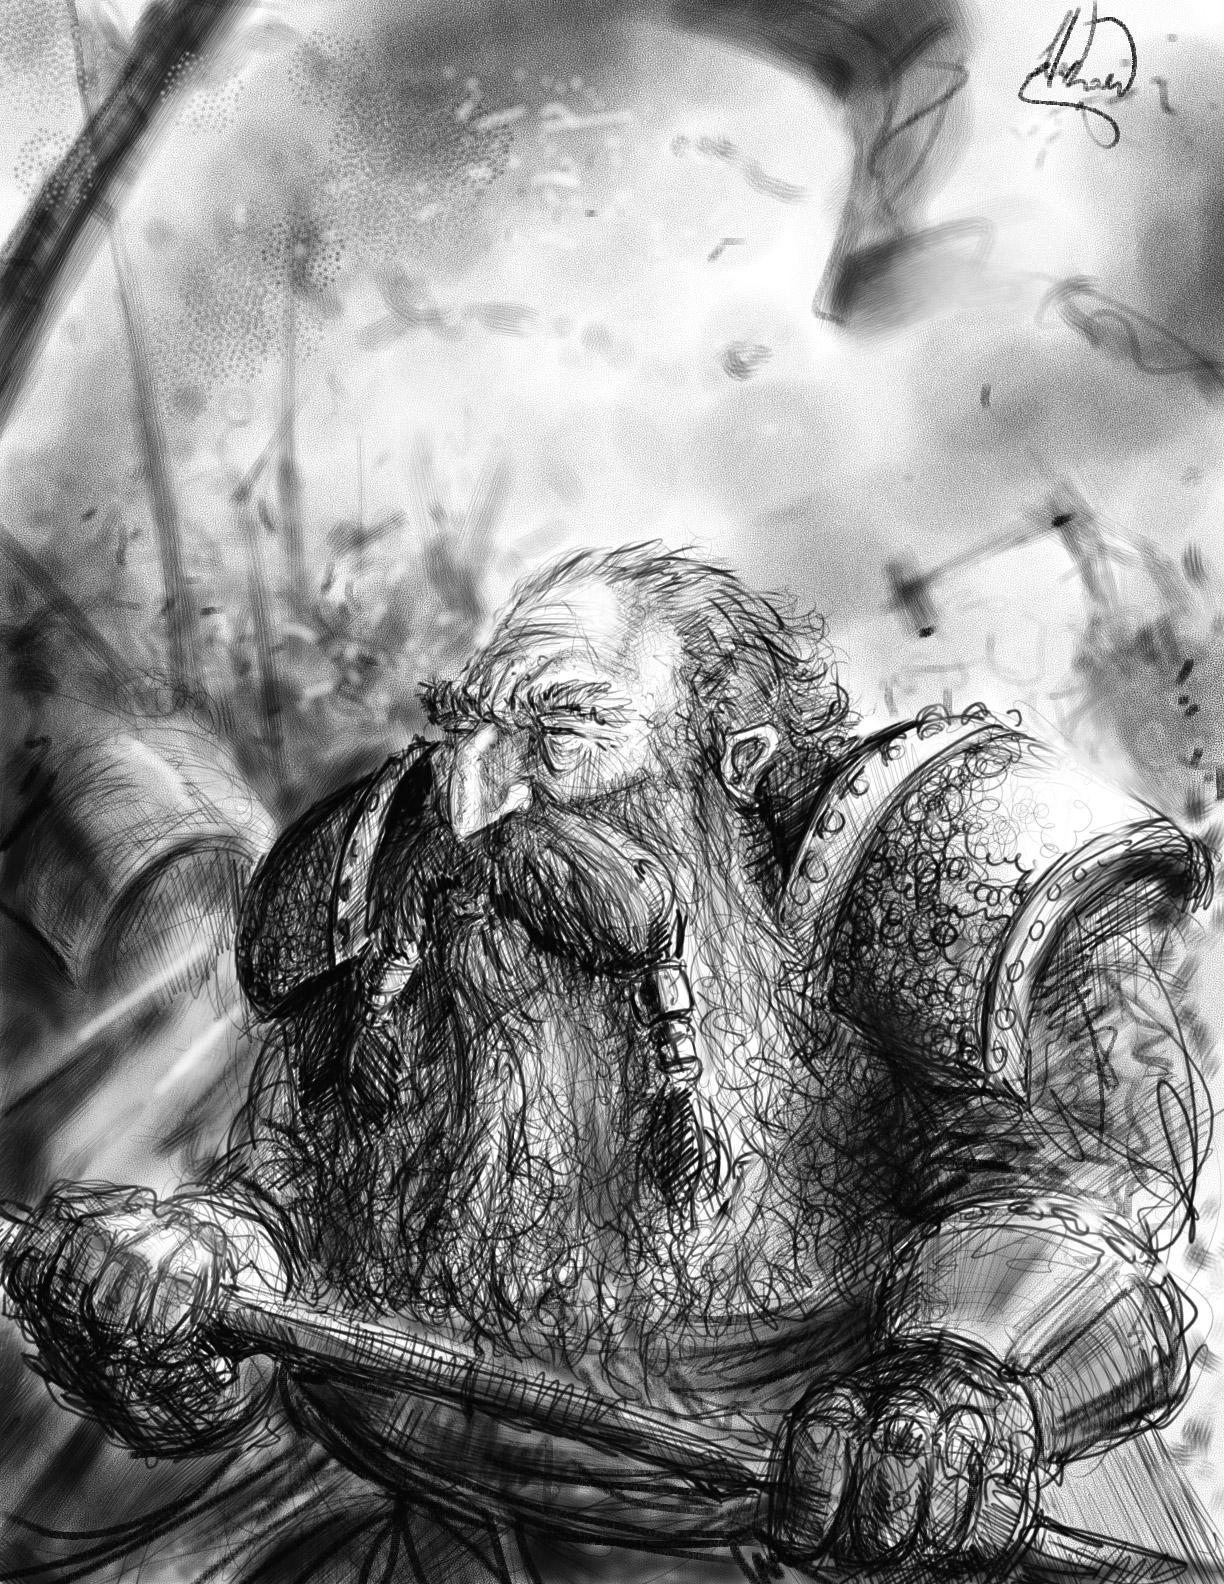 Dwarf - 01 by AlexanderLeon